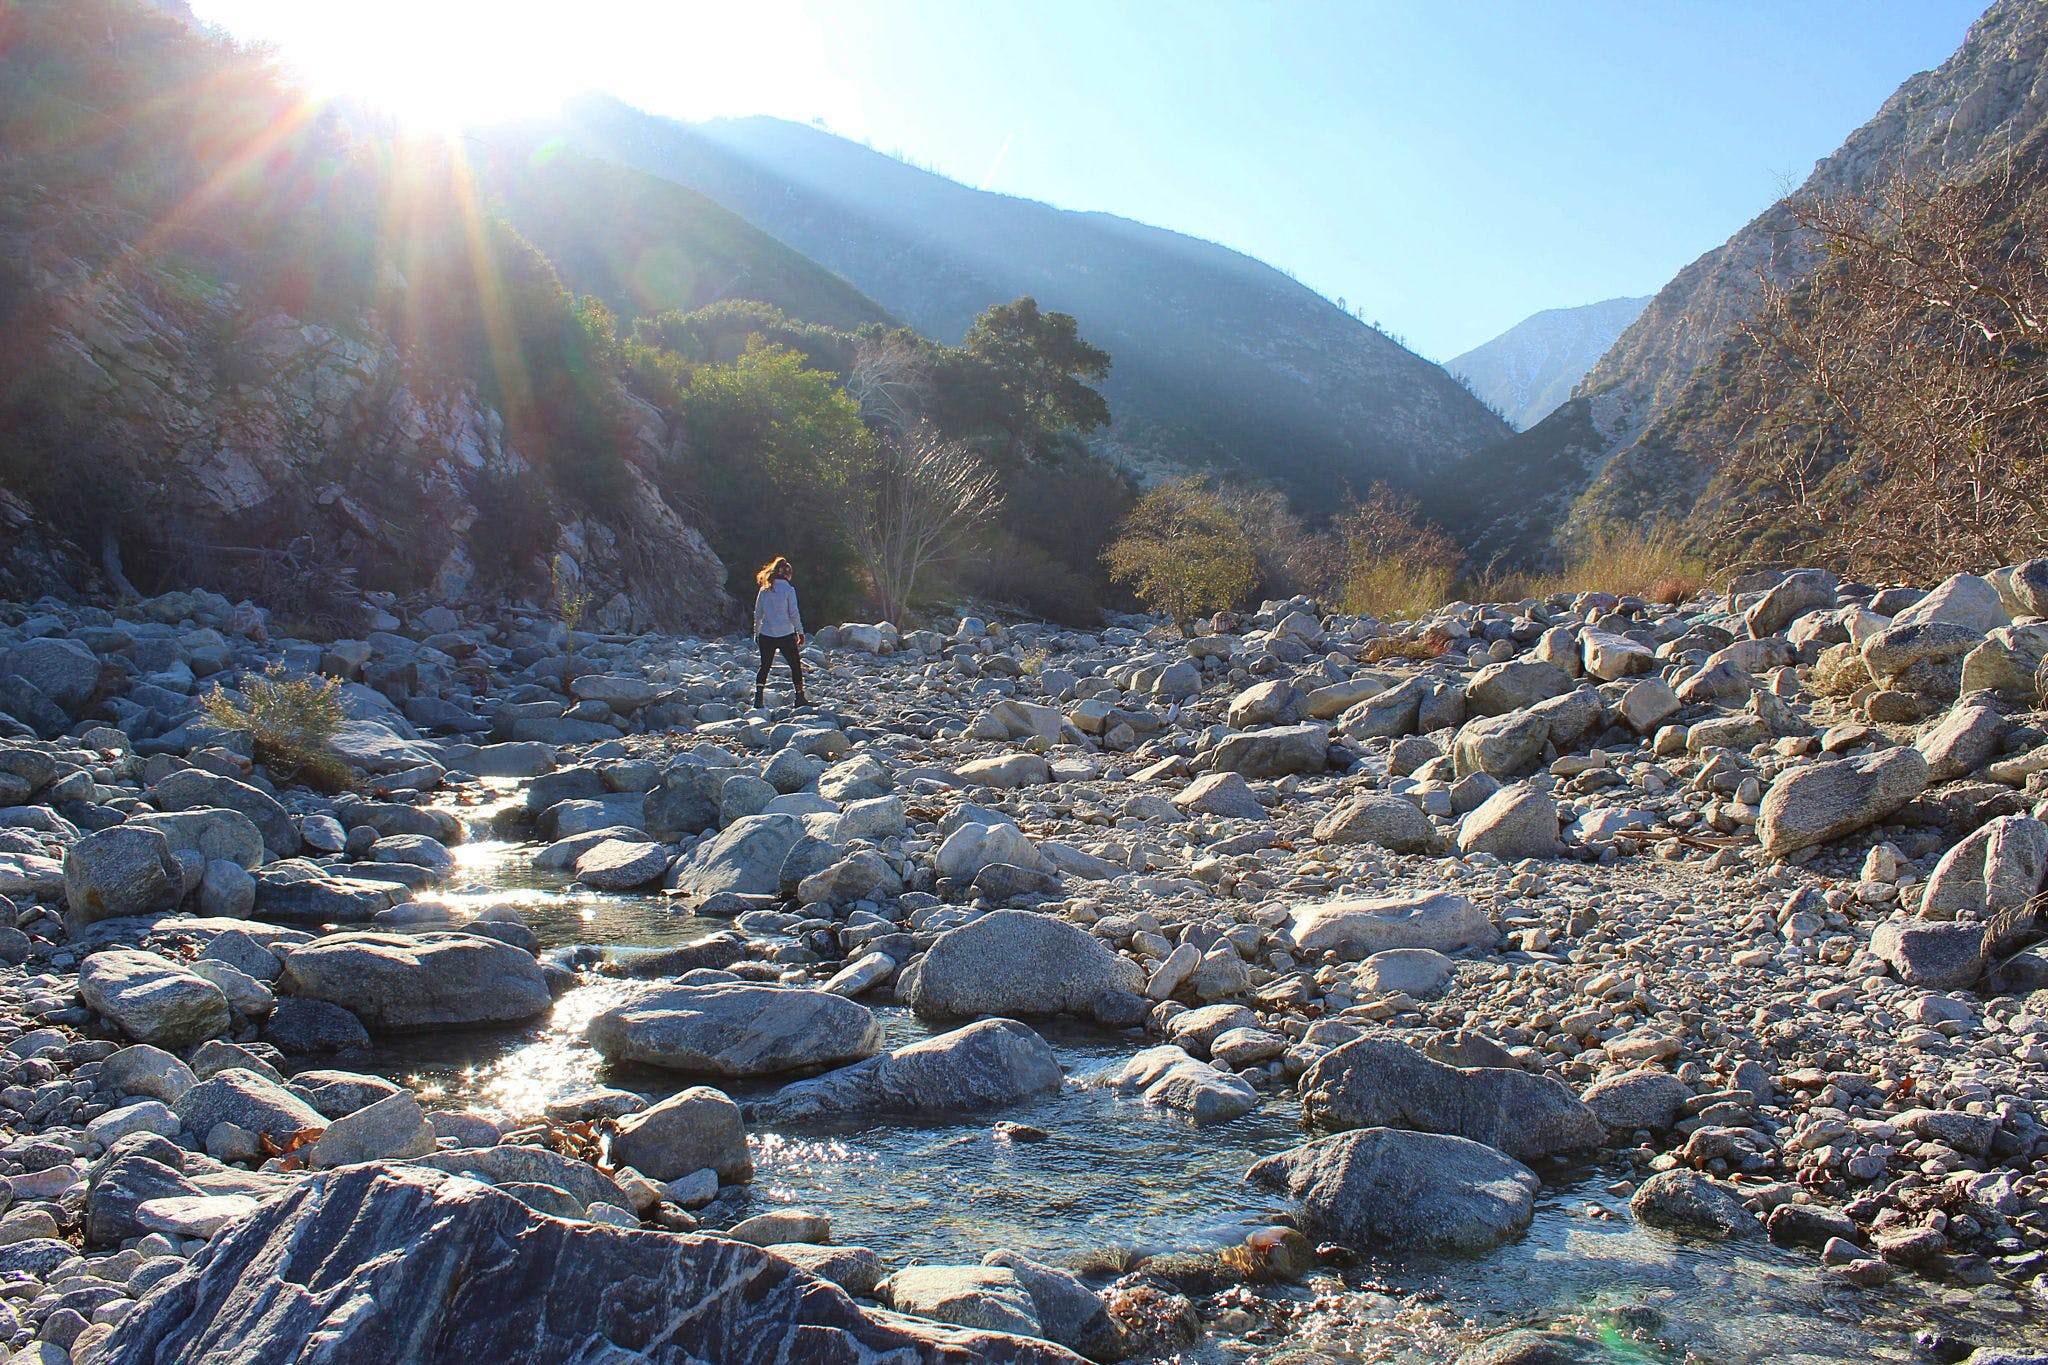 Hike to Bonita Falls in the San Gabriels